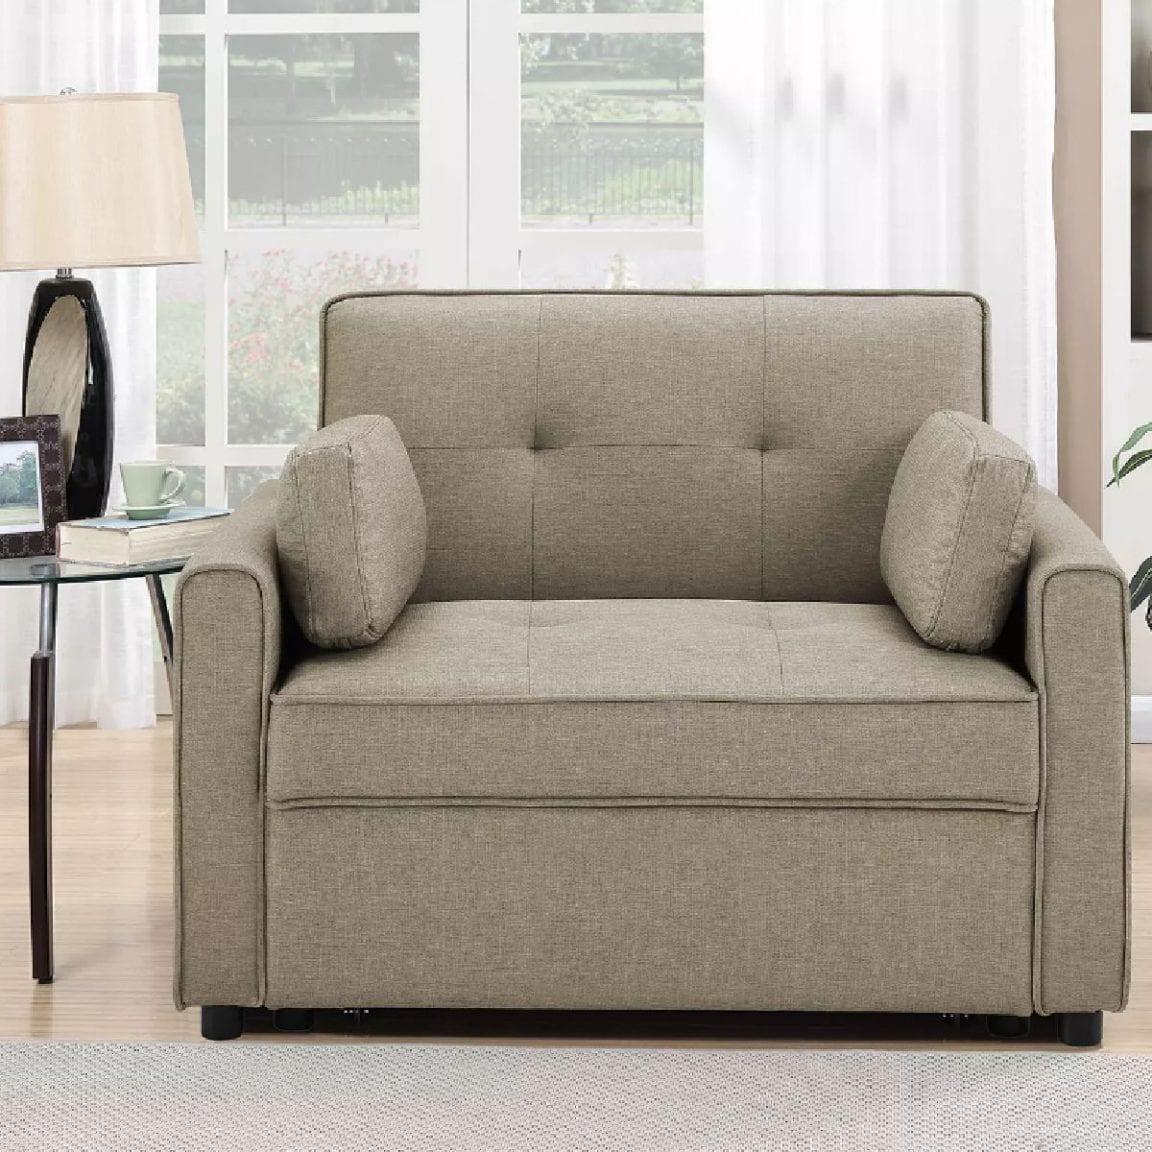 Serta Chloe Twin Pull Out Sleeper Chair $449 25 off ...